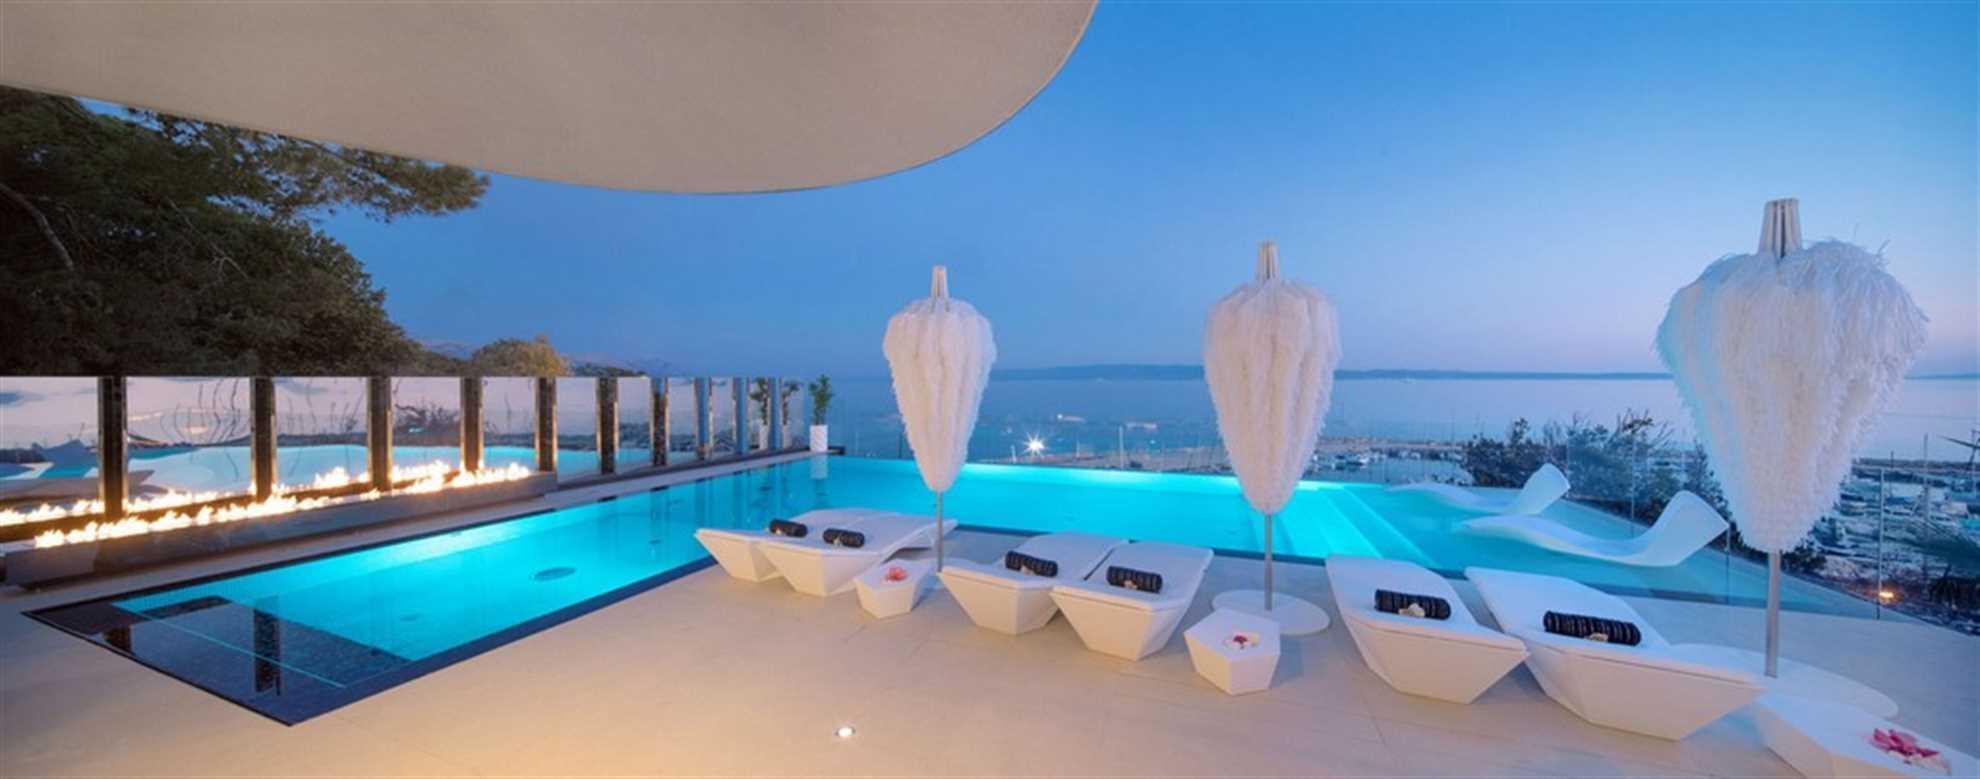 Infinity pool of the Posh residence